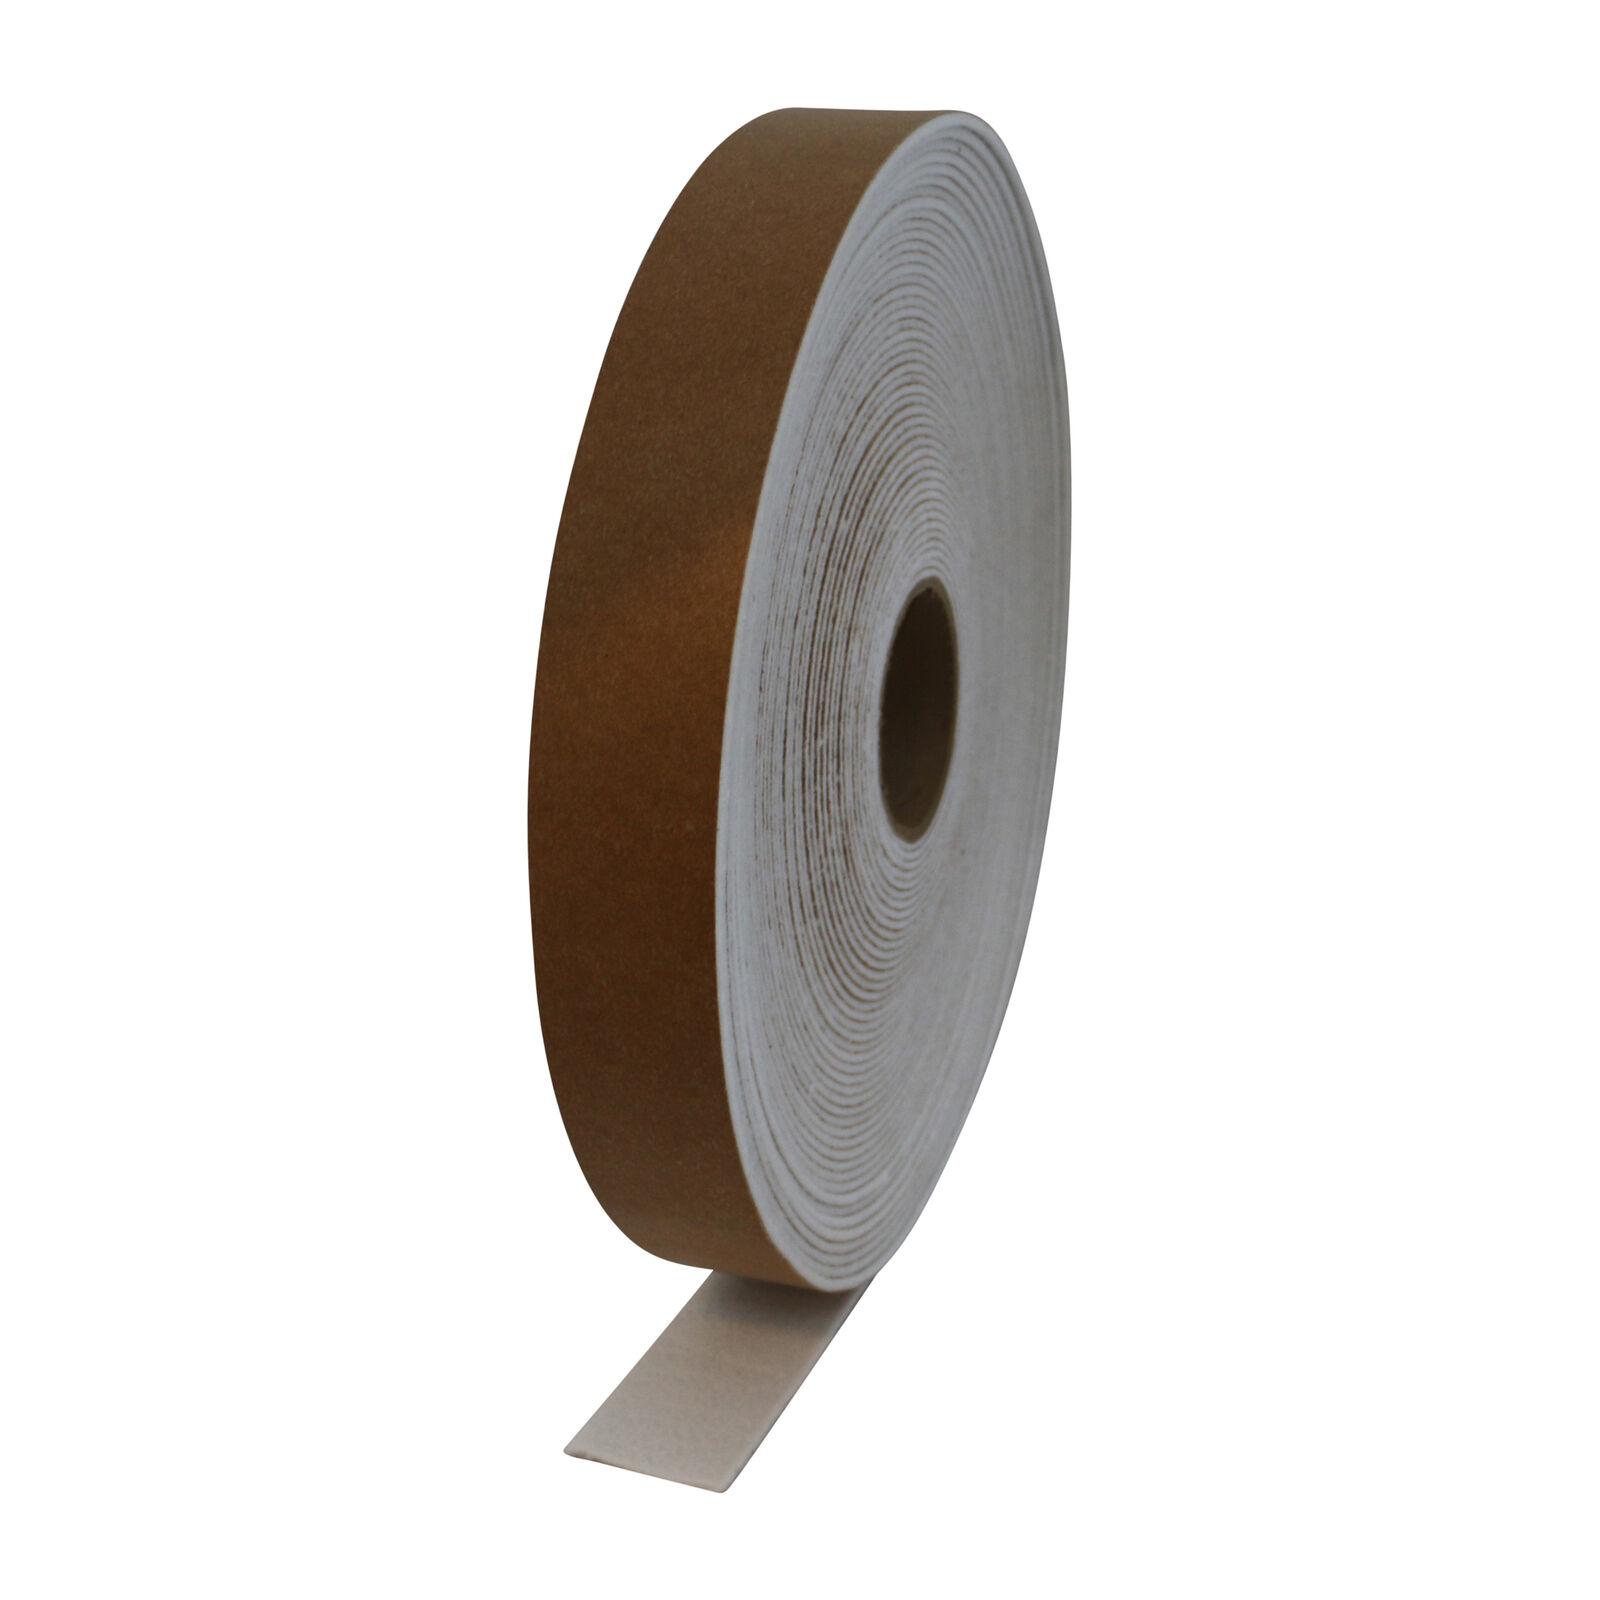 3//4 in JVCC FELT-08 Polyester Felt Tape 3mm thickness, Black x 10 ft.